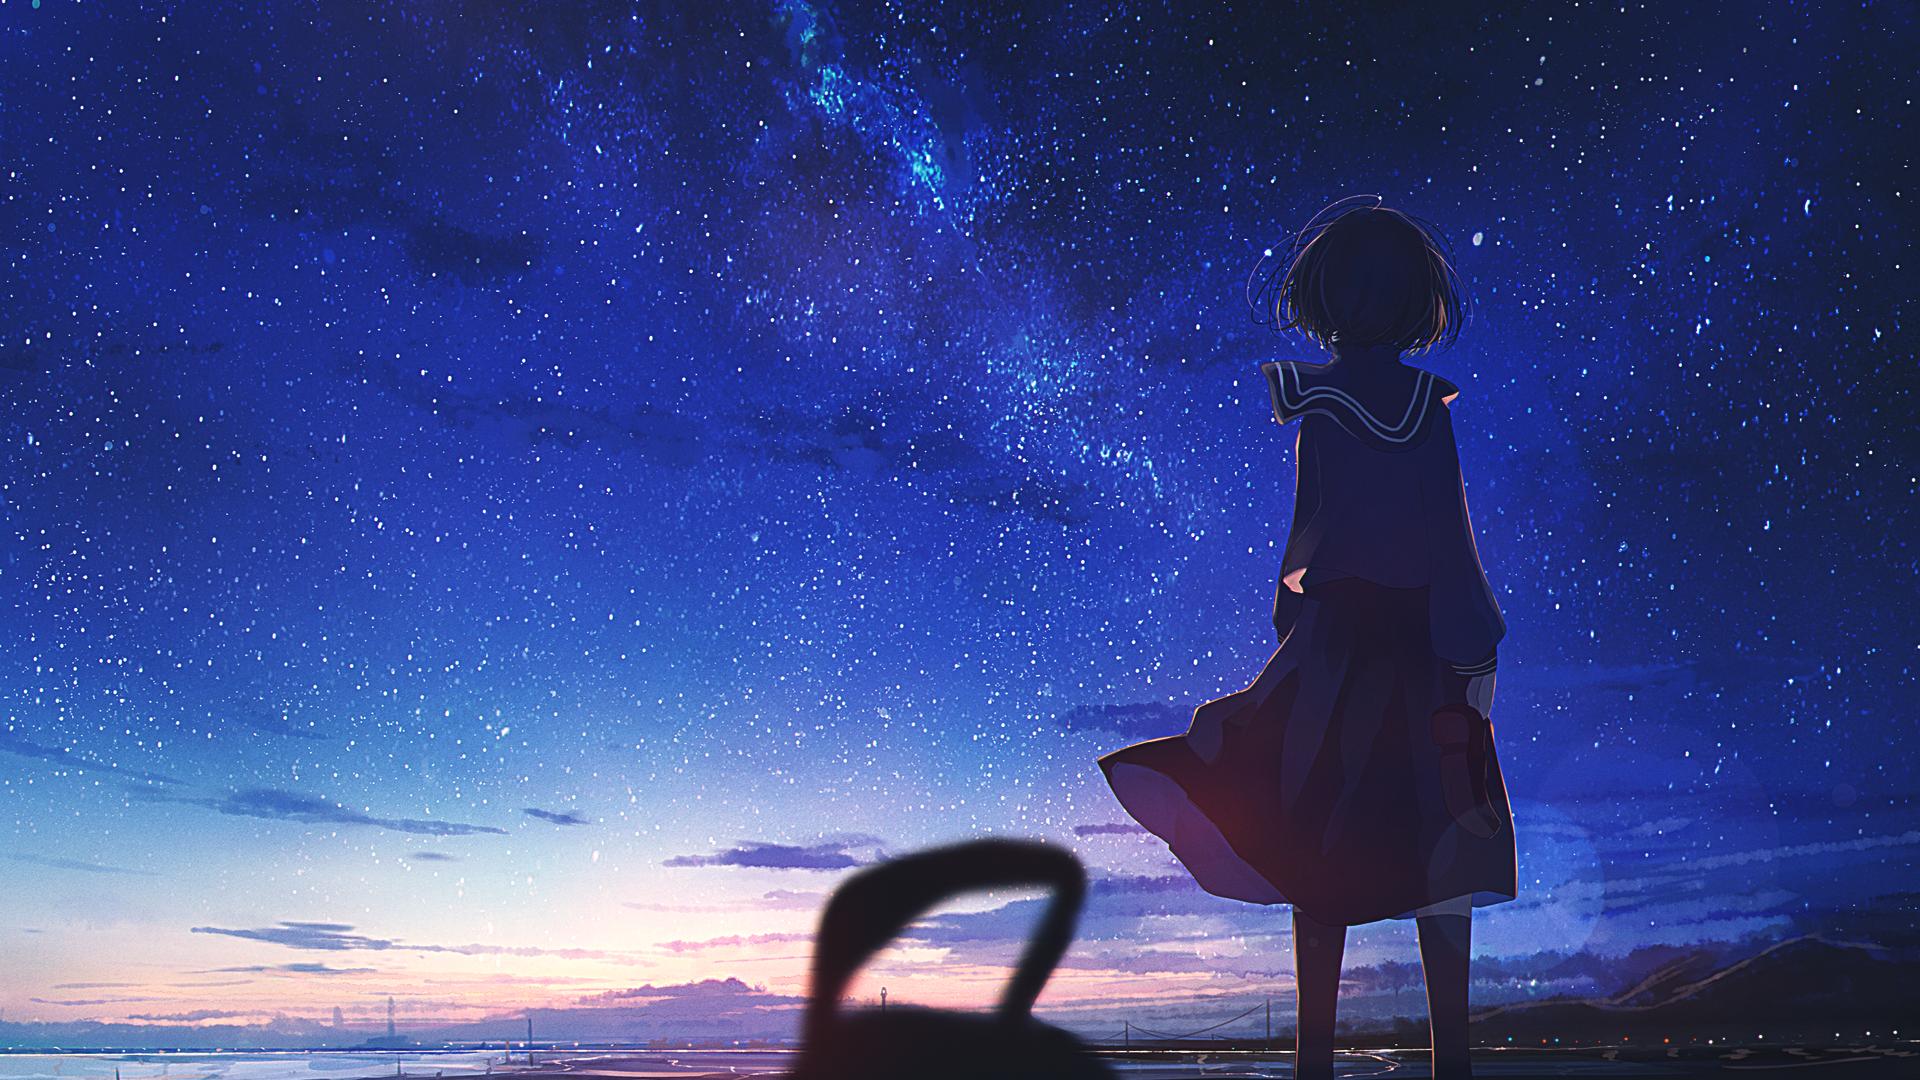 Anime 1920x1080 starry night anime girls anime sky stars outdoors sunset